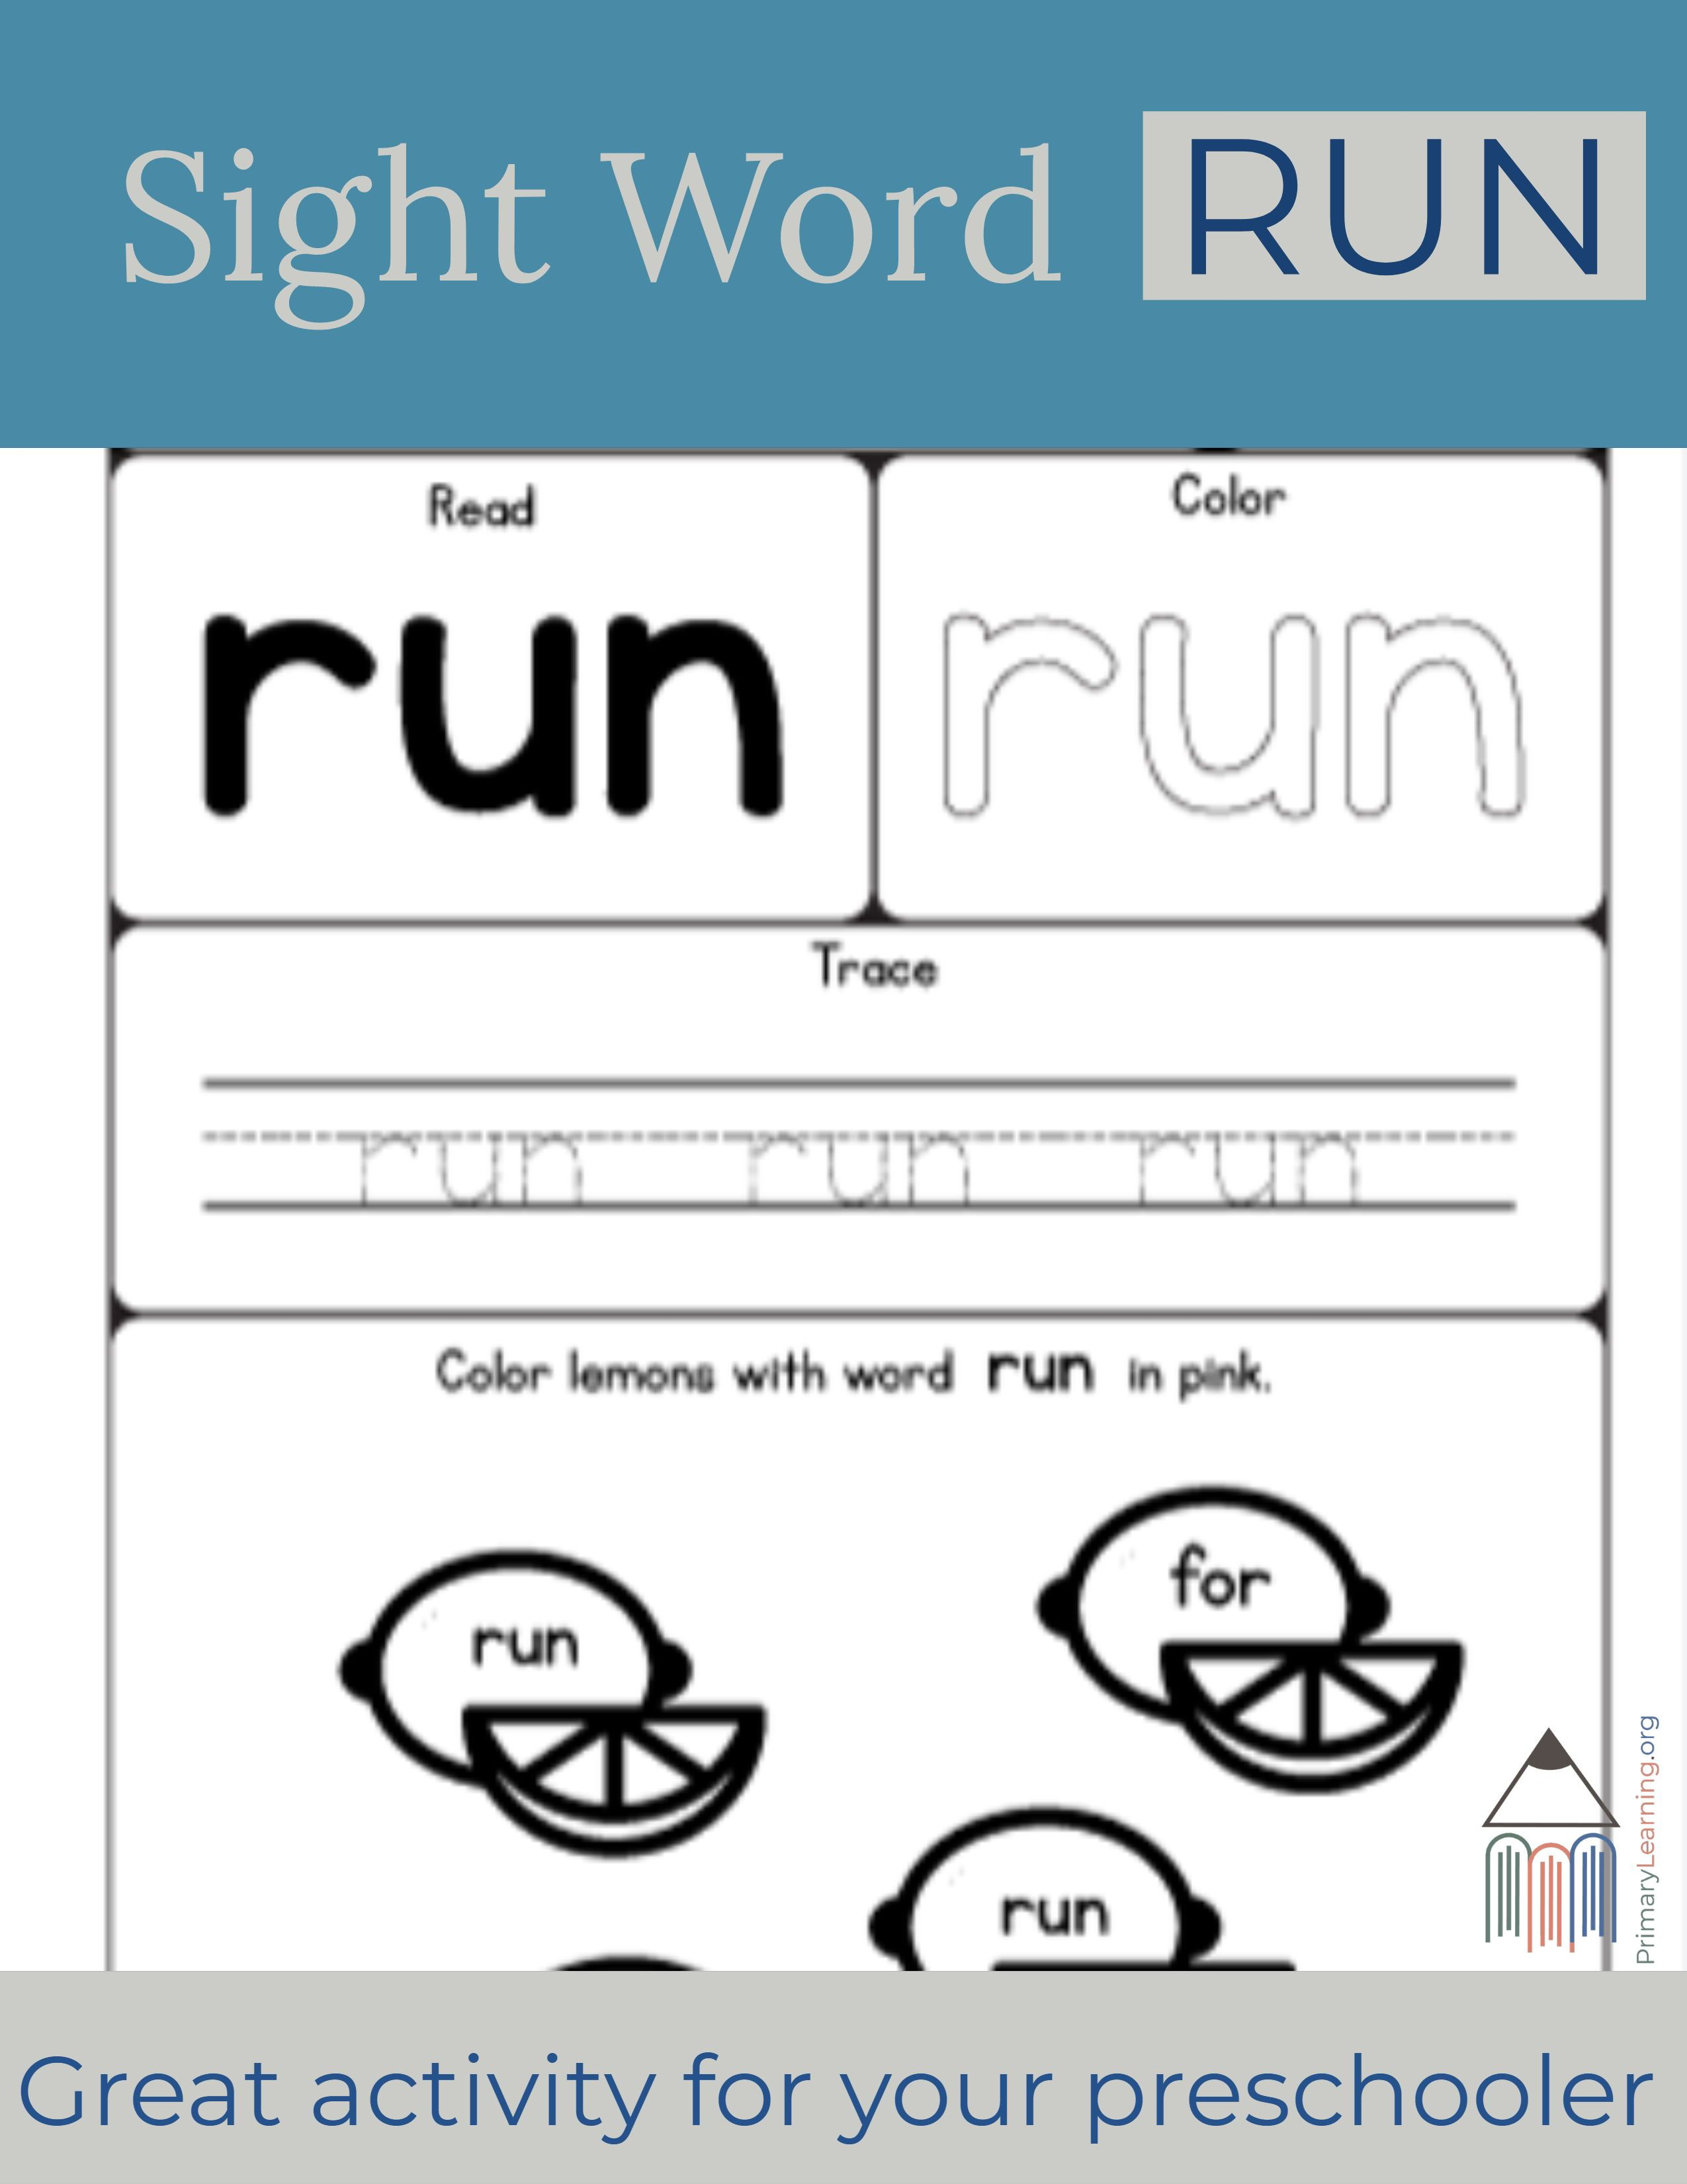 Sight Word Run Worksheet